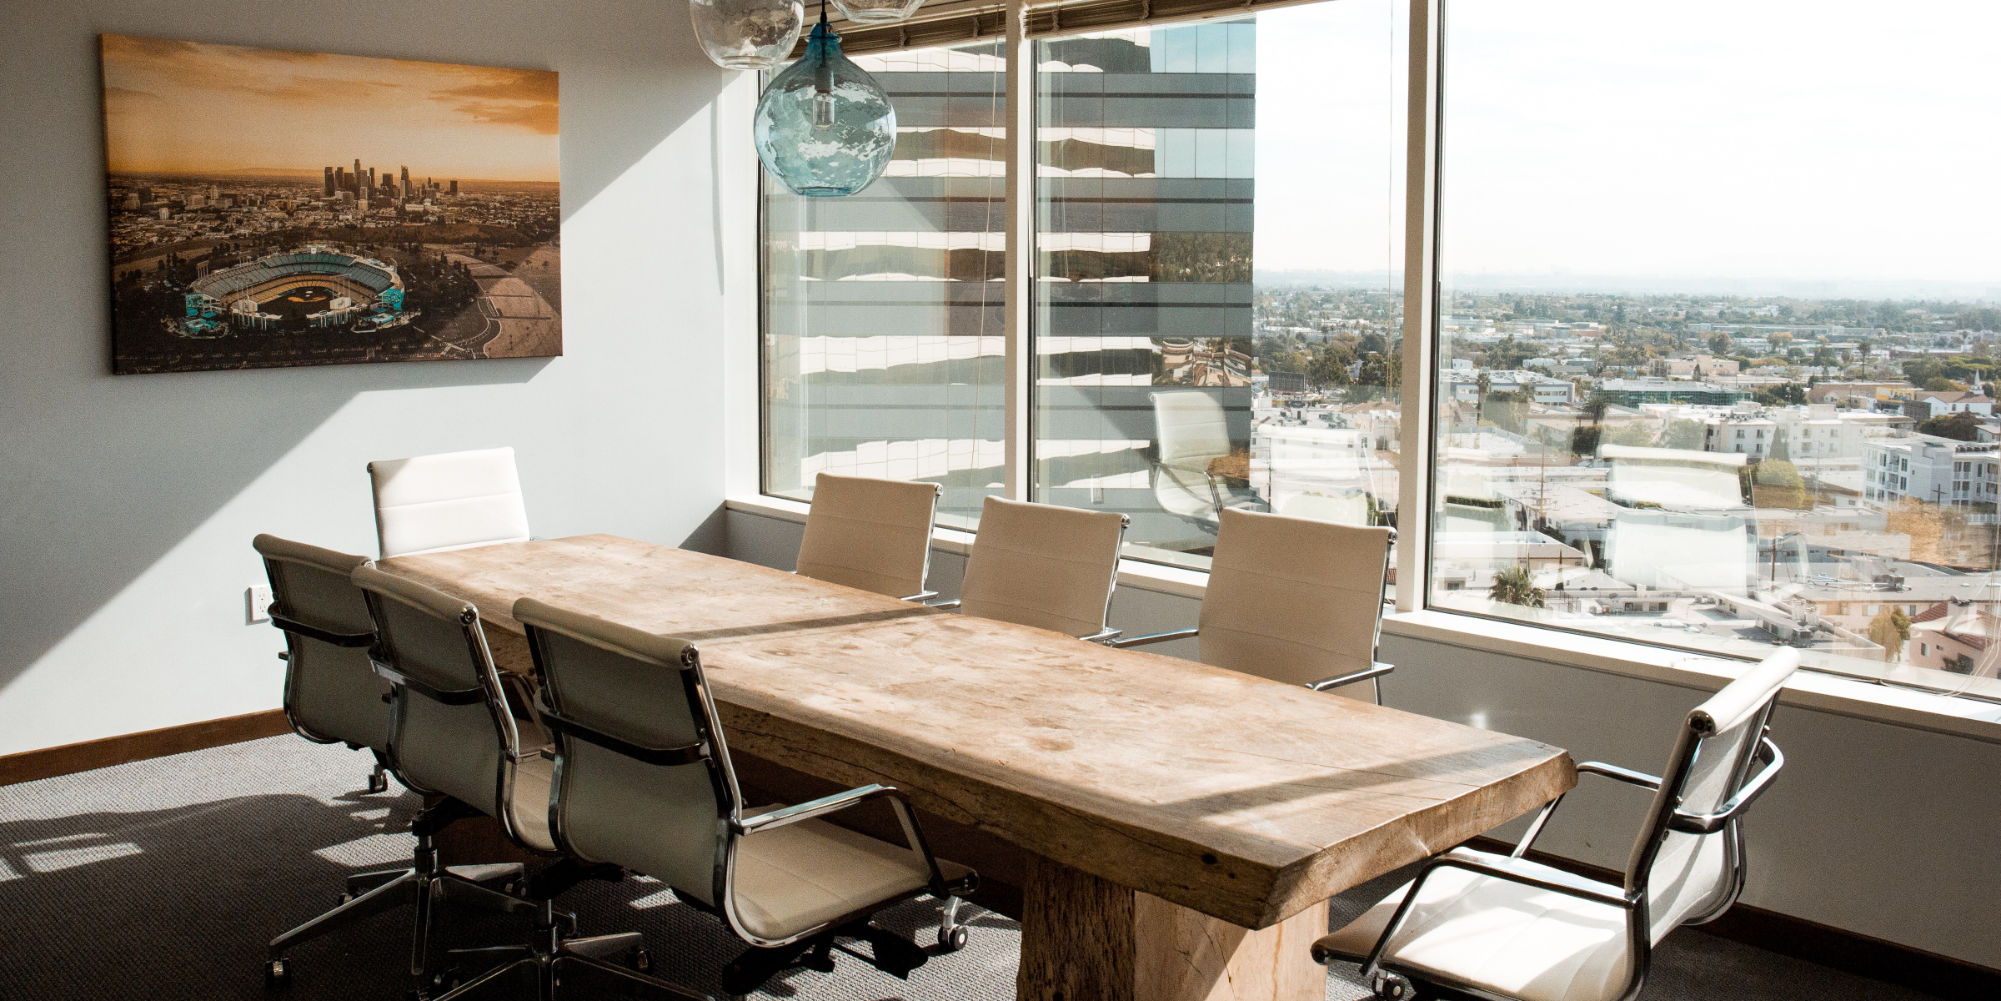 Genius Meetings - une solution performante pour organiser vos séminaires BtoB